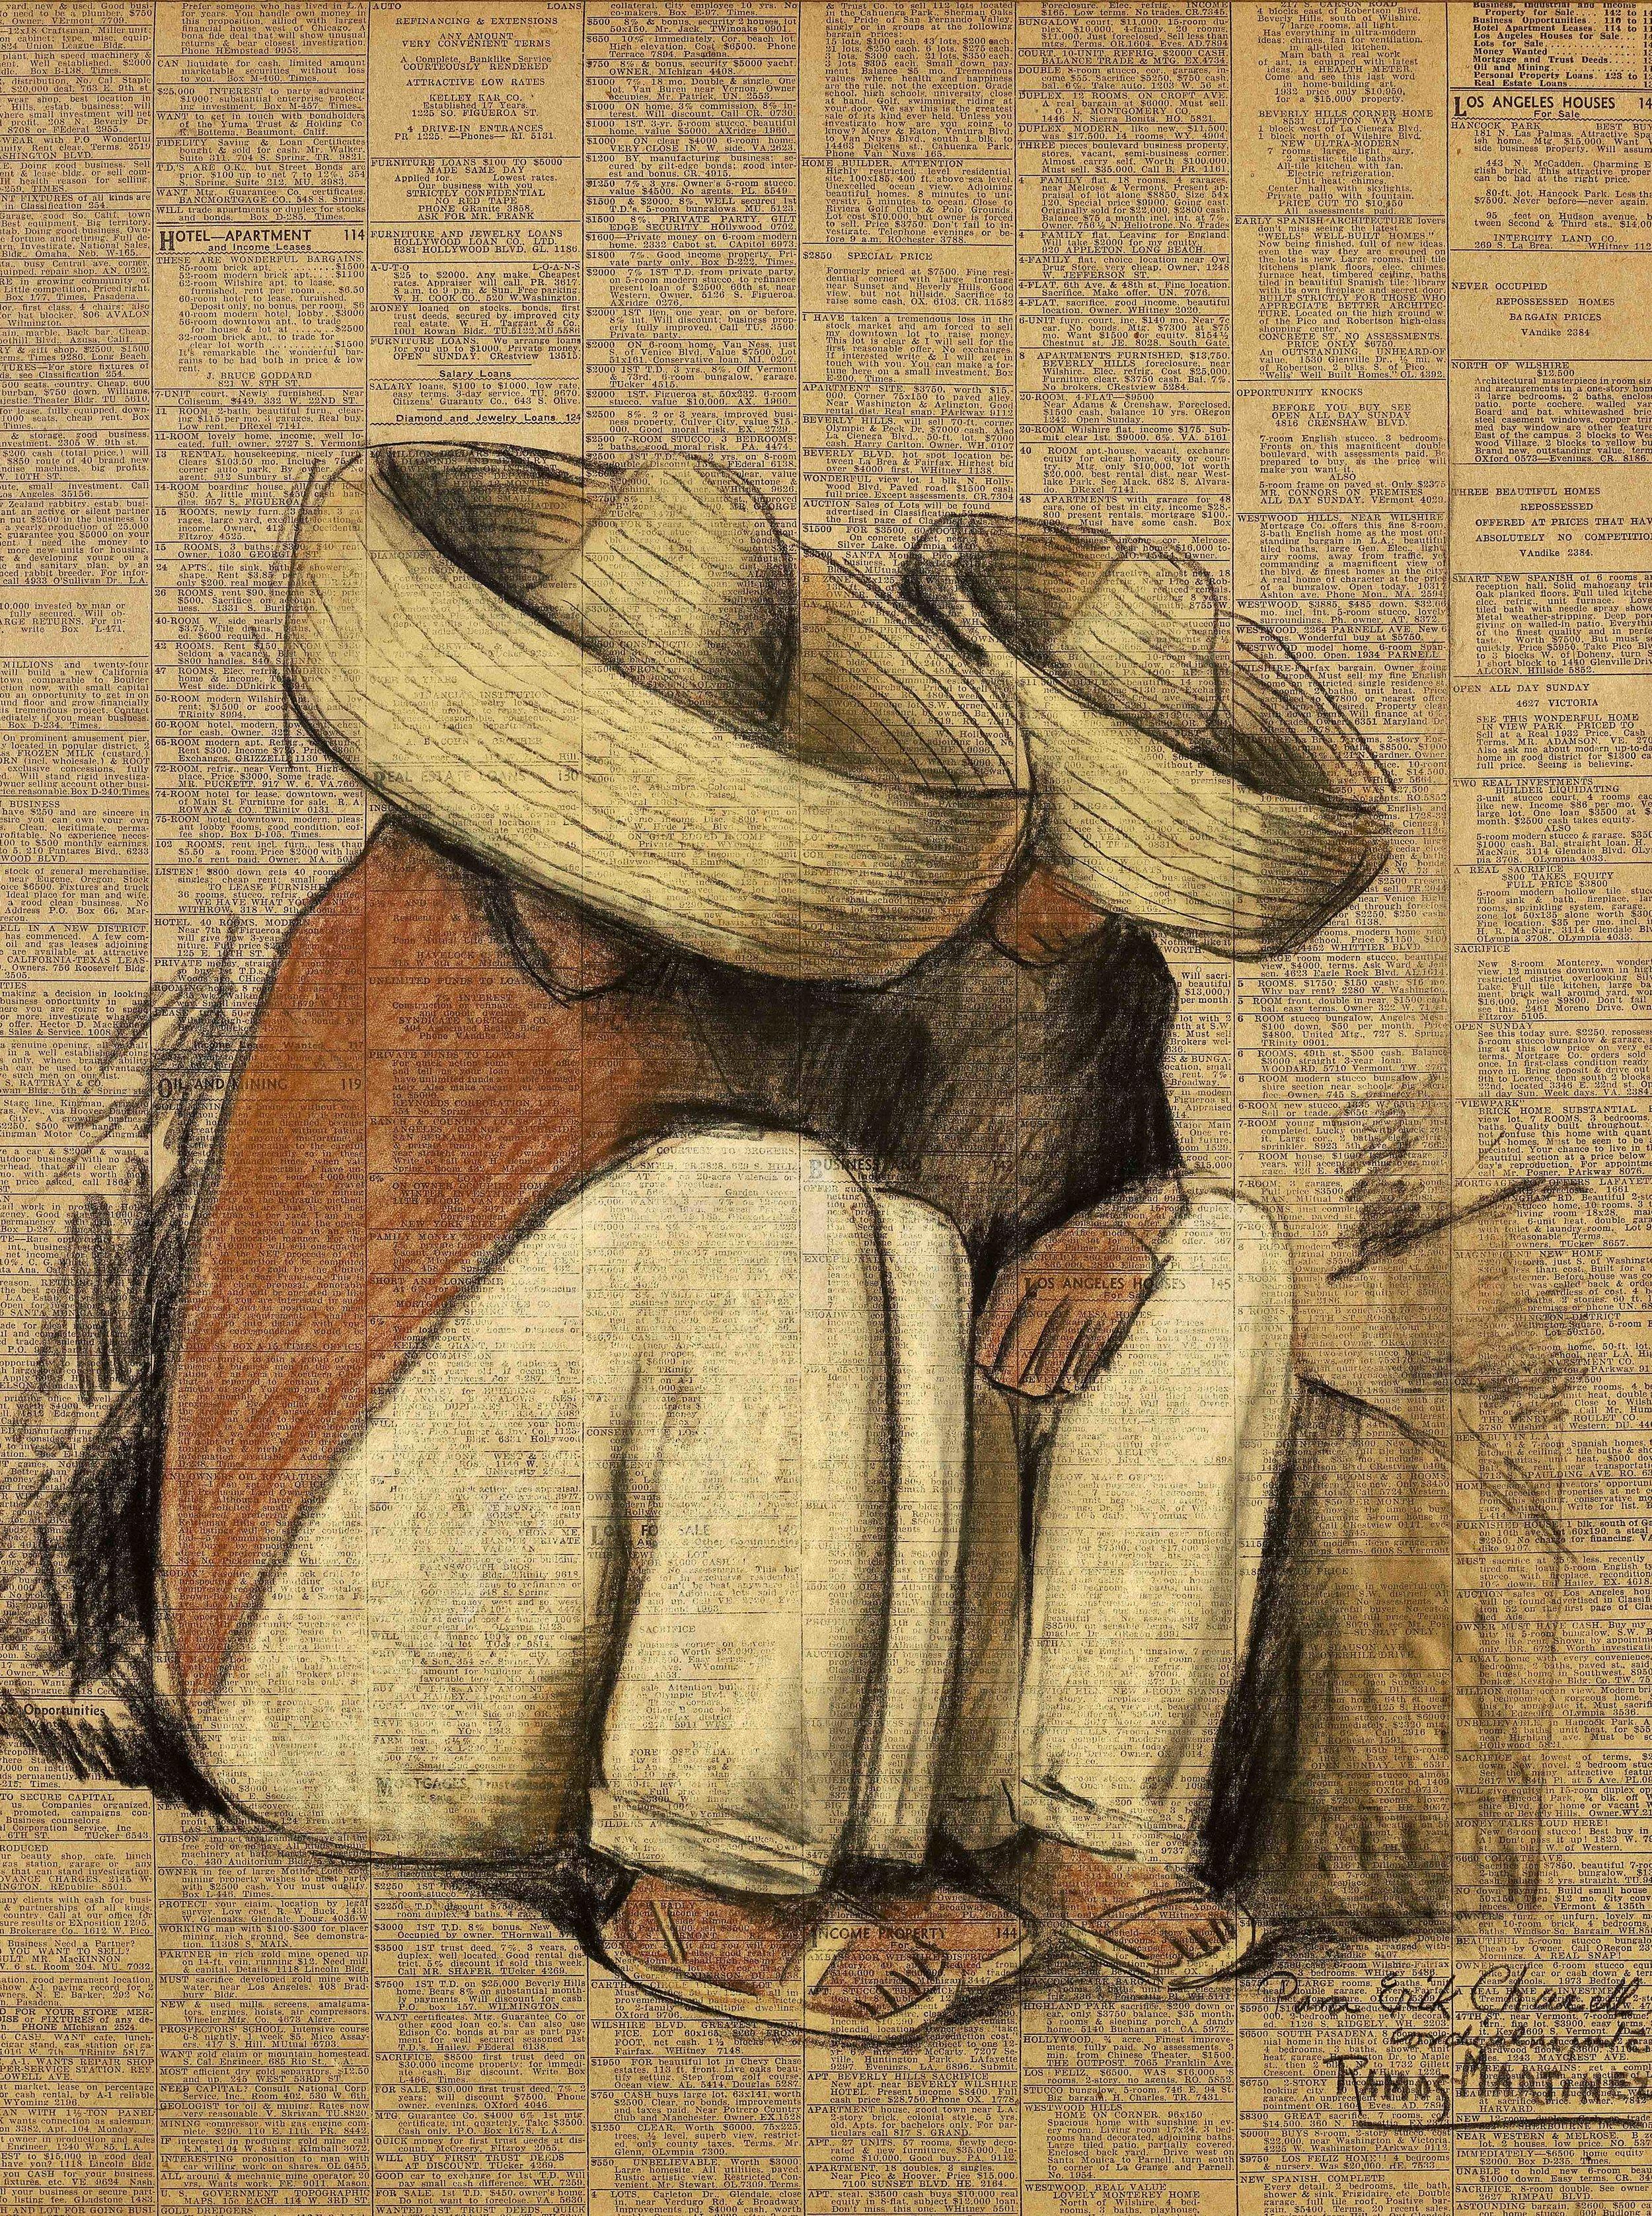 Siesta  1932 pastel, charcoal, and Conté crayon on newsprint / pintura al pastel, carbón y crayon Conté sobre papel periódico ( Los Angeles Times ) 21 x 15.5 inches / 53.3 x 39.4 centímetros Private collection